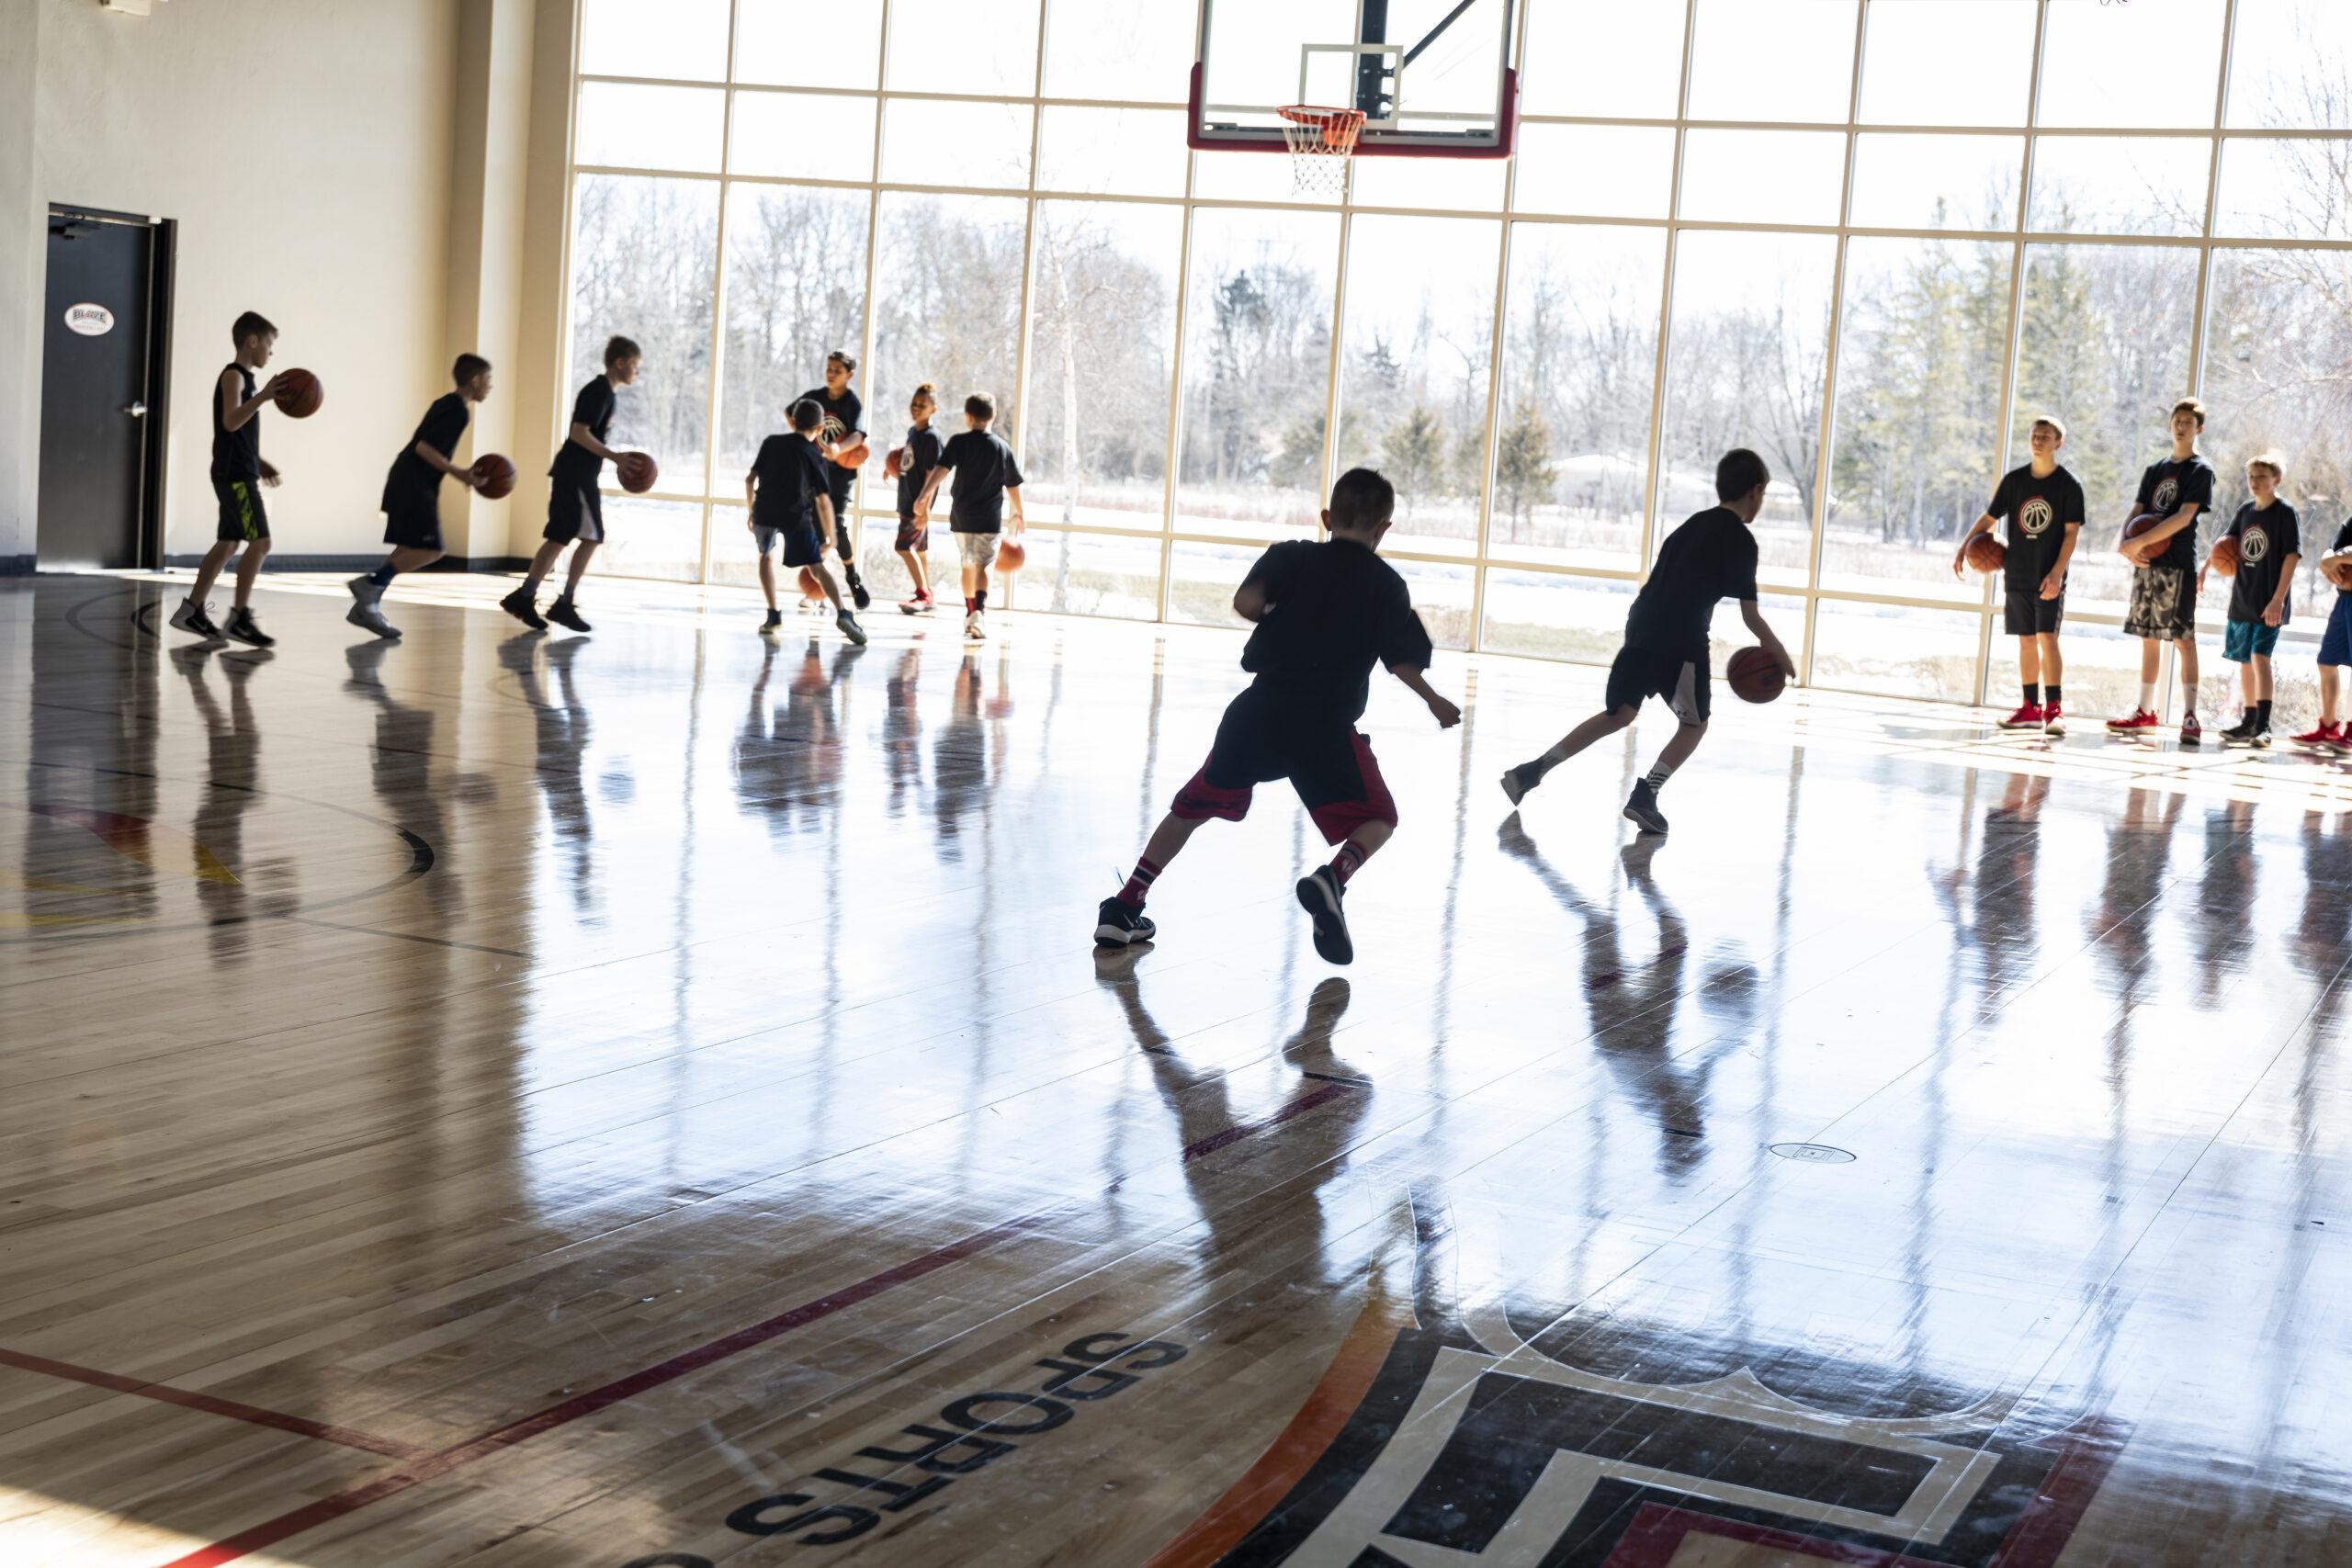 Blaze Basketball Champs Camp